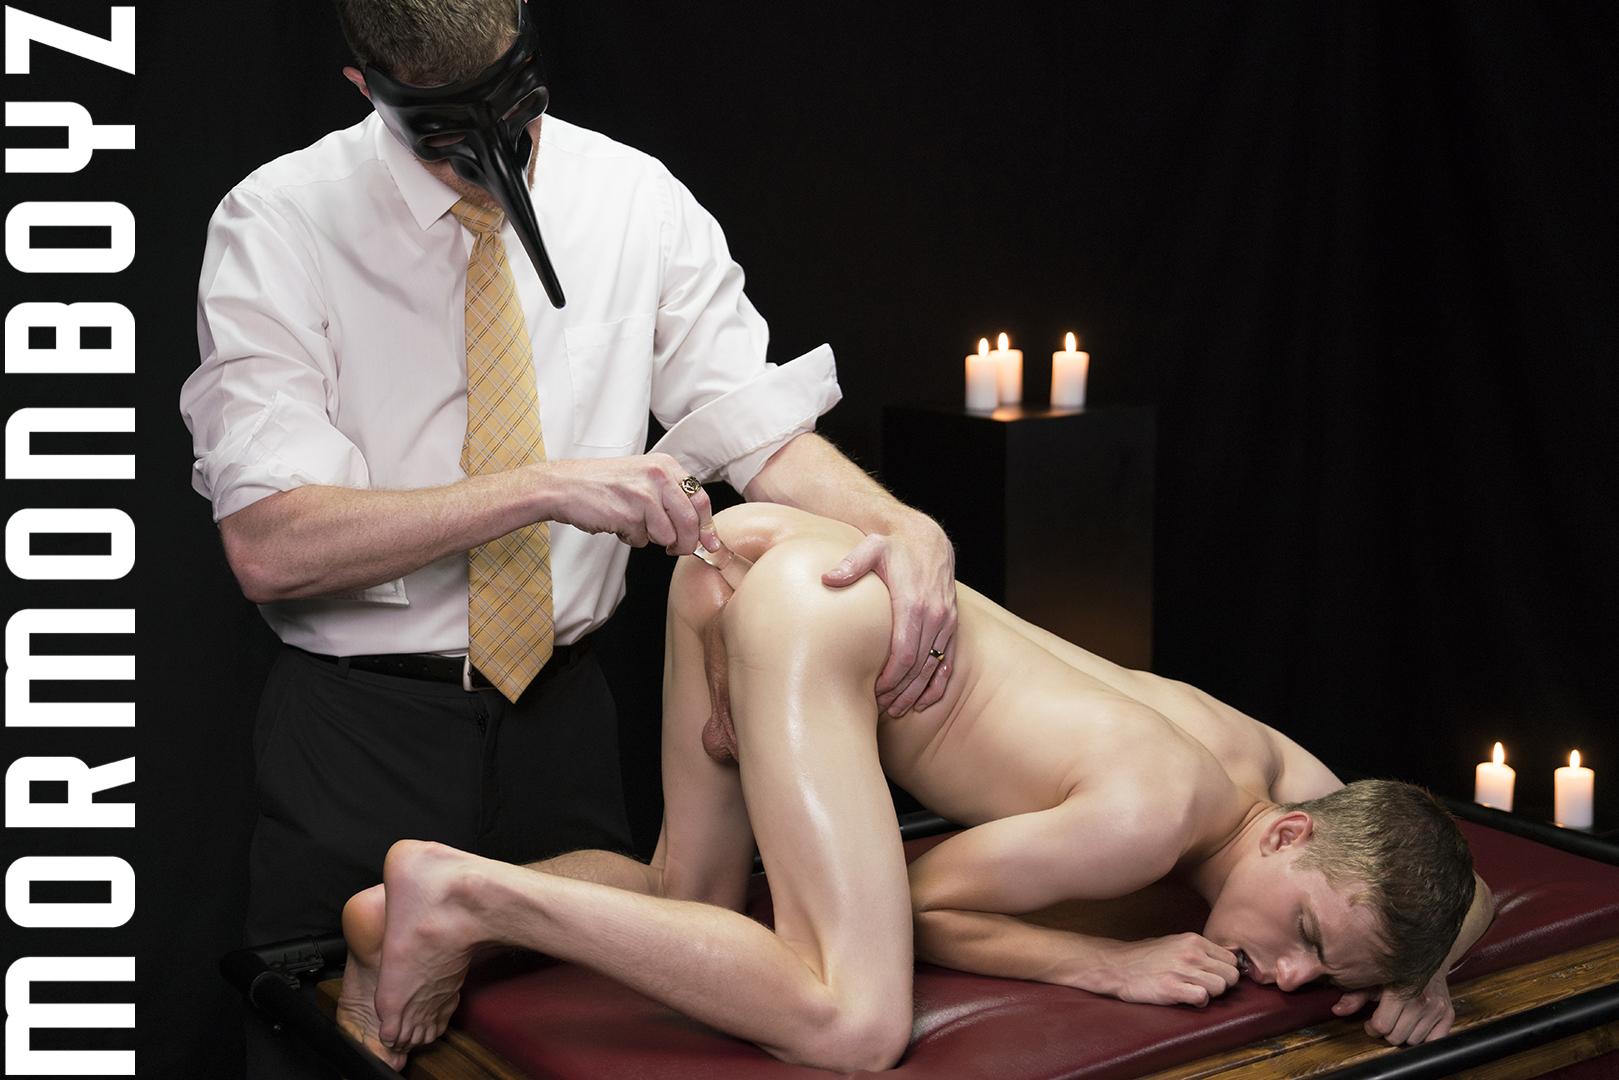 170820_mbz_07-mormonboyz-gay-daddy-son-sex_pic15